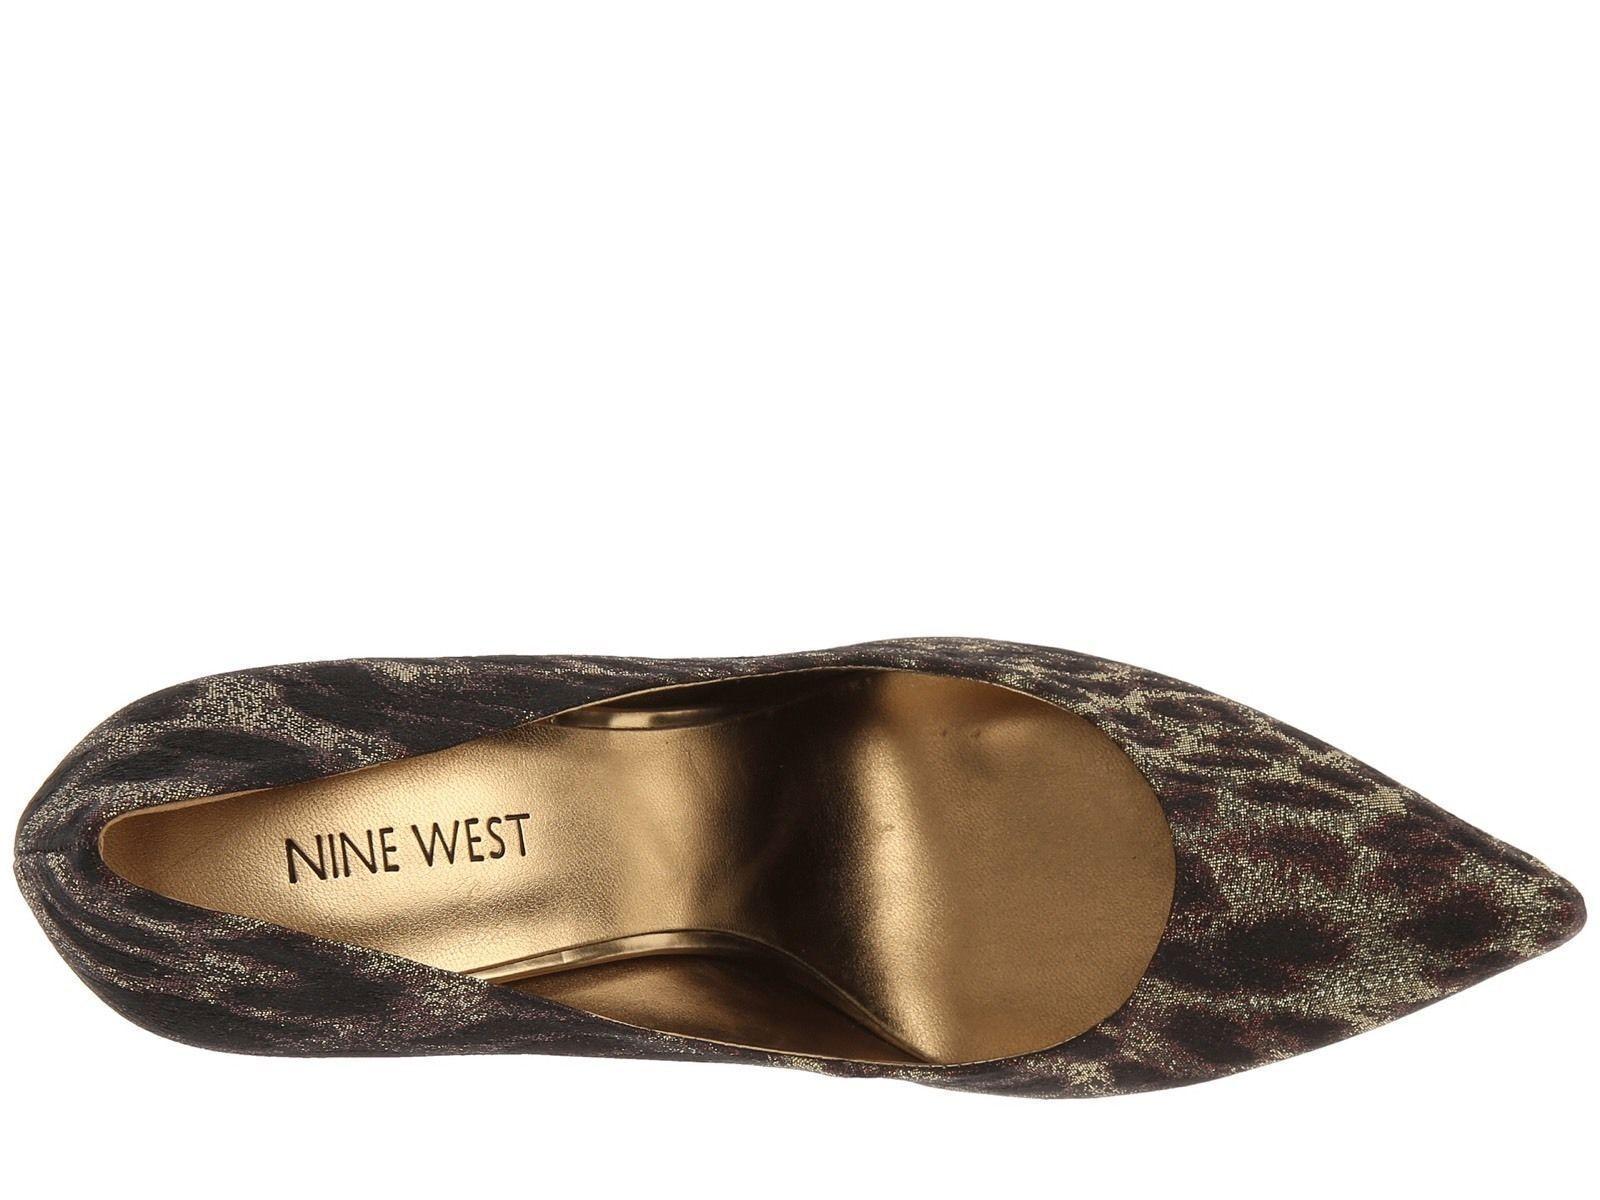 Nine West Flax Bronze Gold Animal Heal Classics Heal Animal Pointy Toe Pump Schuhes 7 M USA 8ce960